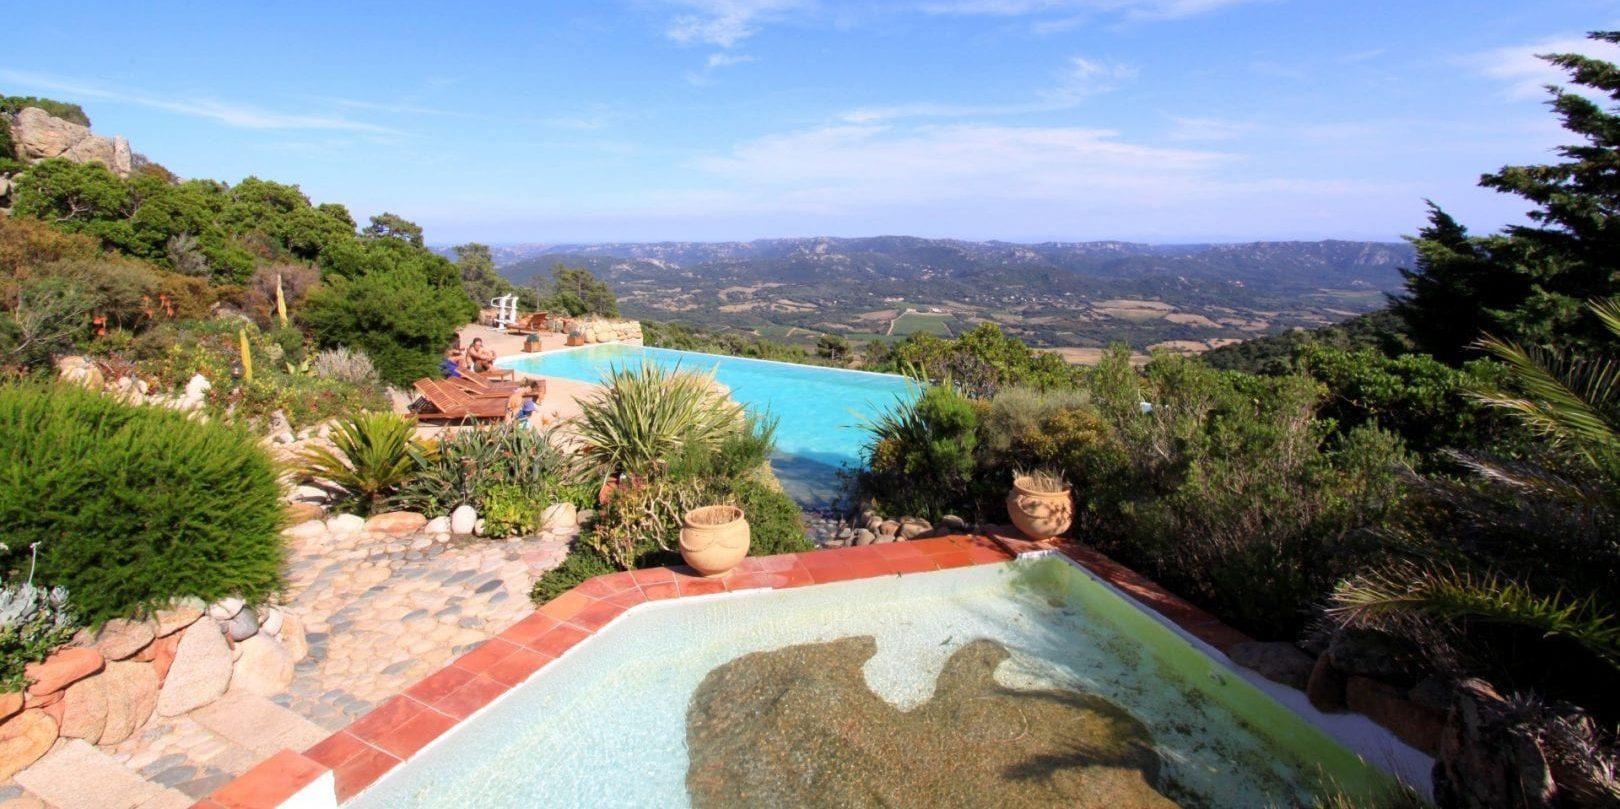 Ferme Auberge Domaine de Piscia Figari Corsica Frankrijk